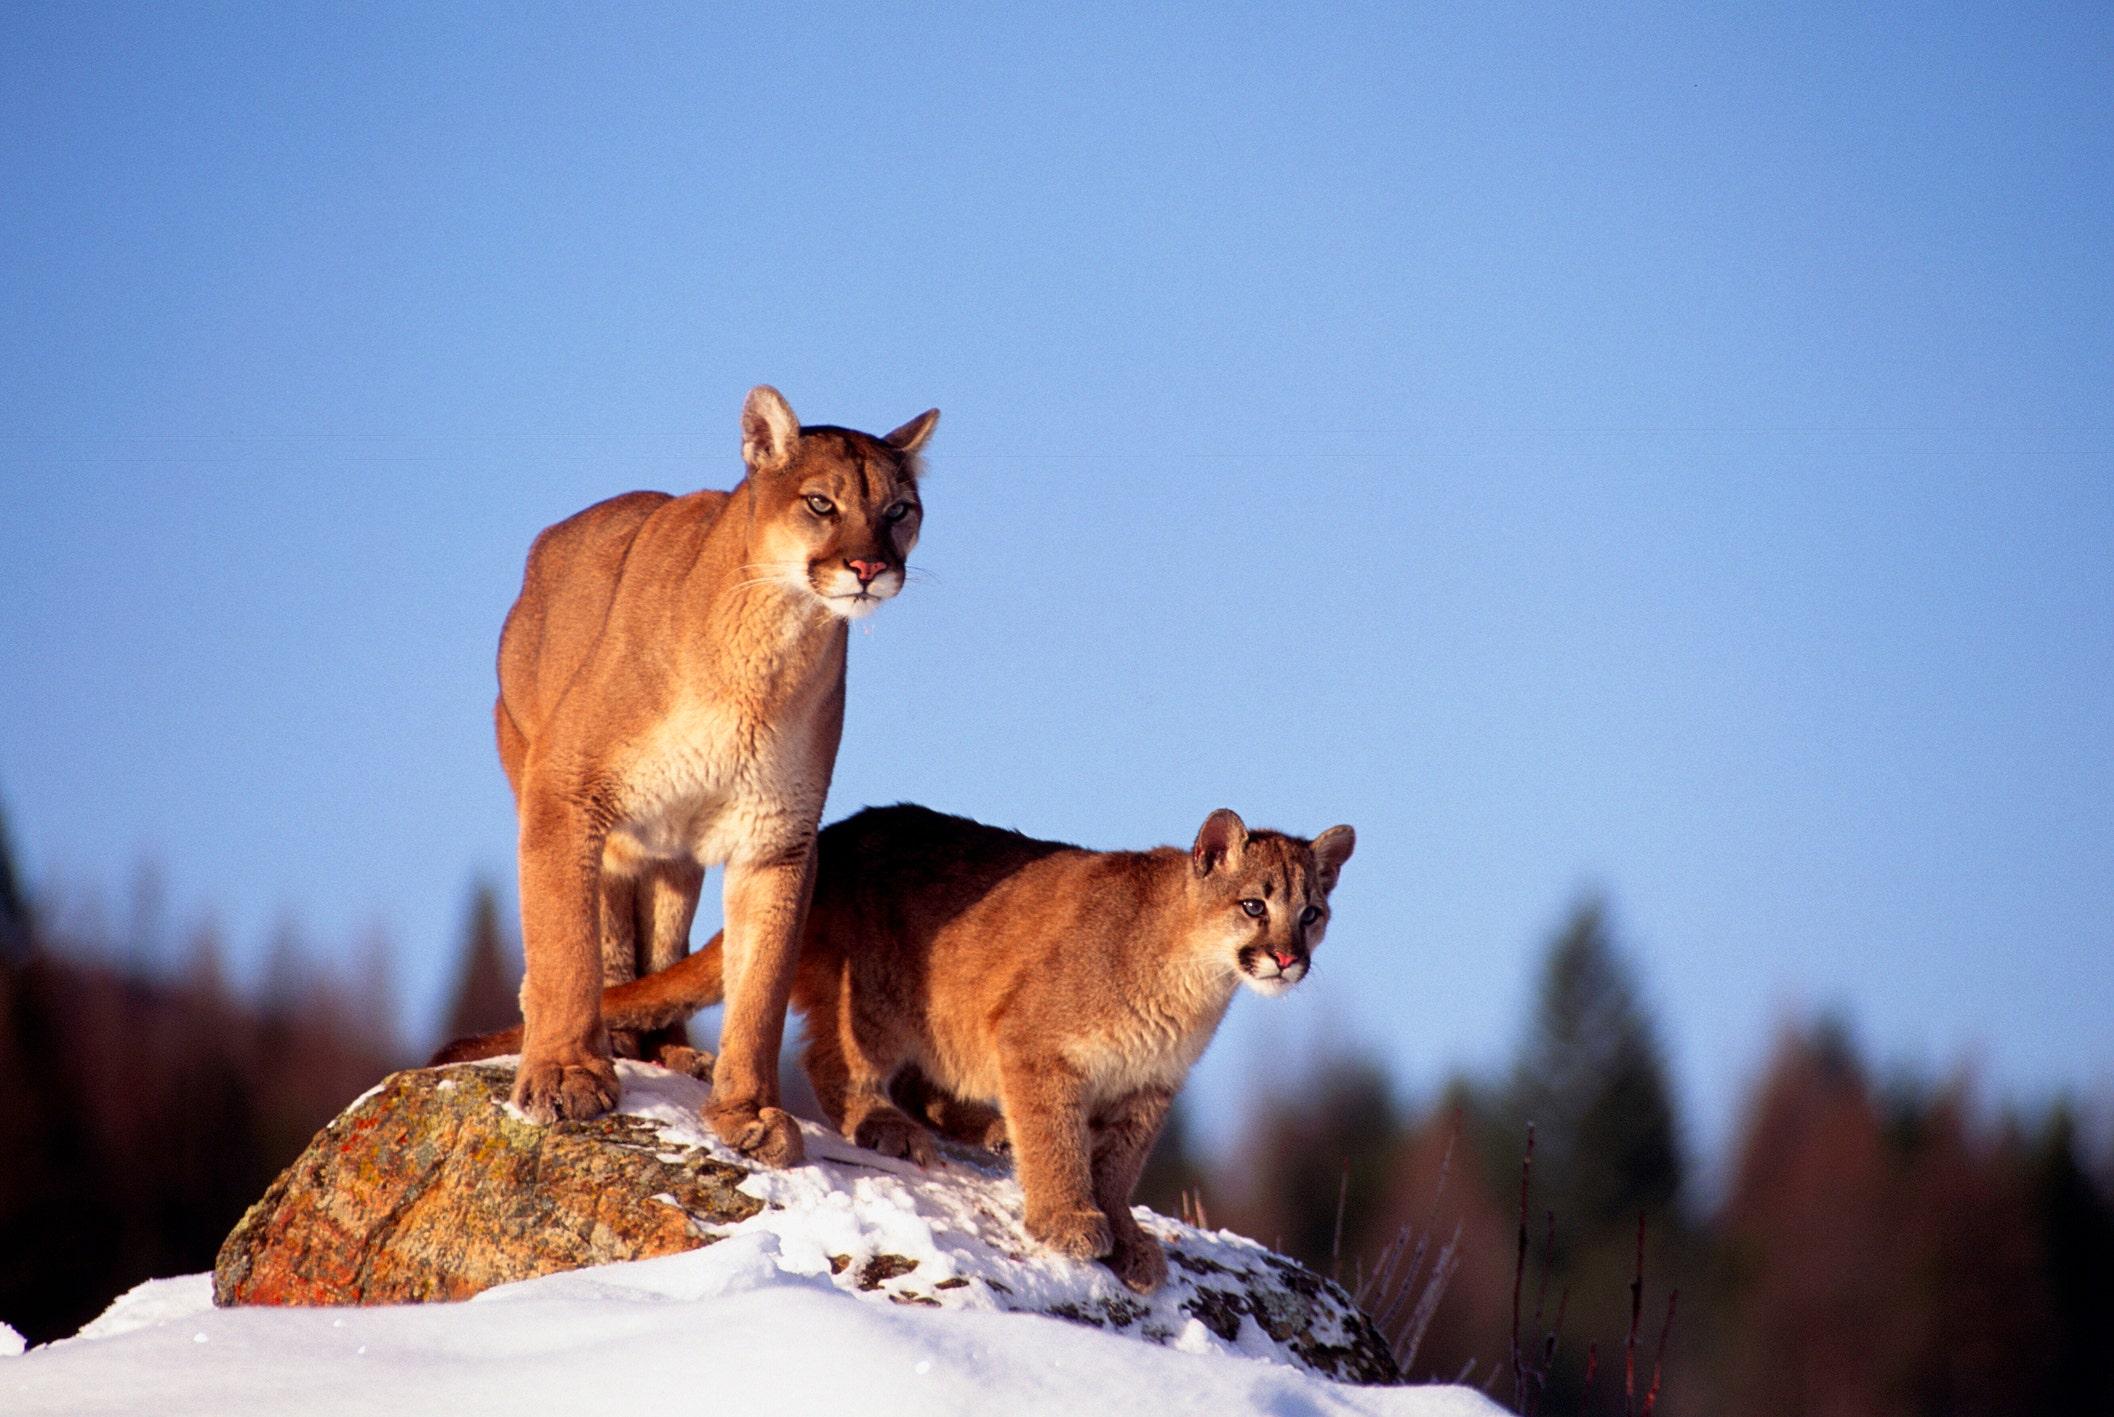 Westlake Legal Group MountainLionsiStock Arizona authorities kill 3 mountain lions found devouring human remains Jack Durschlag fox-news/us/us-regions/southwest/arizona fox-news/science/wild-nature/mammals fox-news/science/wild-nature fox news fnc/science fnc f54d00f1-b040-5cb0-a9f1-2d0e415fdd8a article